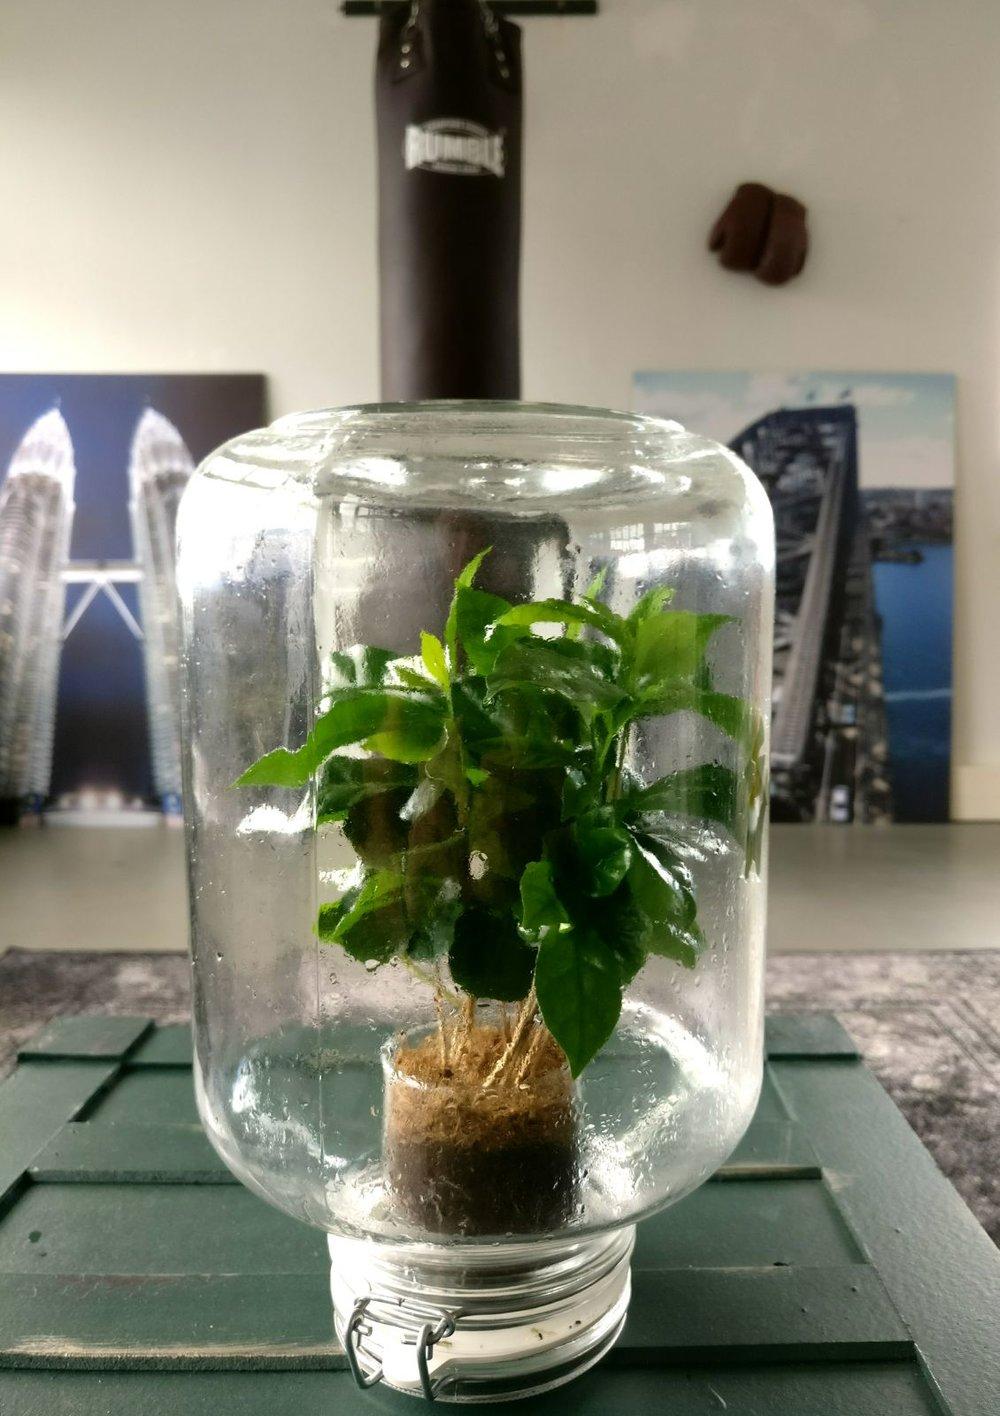 moderne kantoorruimte pikaplant in pot vintage oude kist licht keuken en planten.jpg